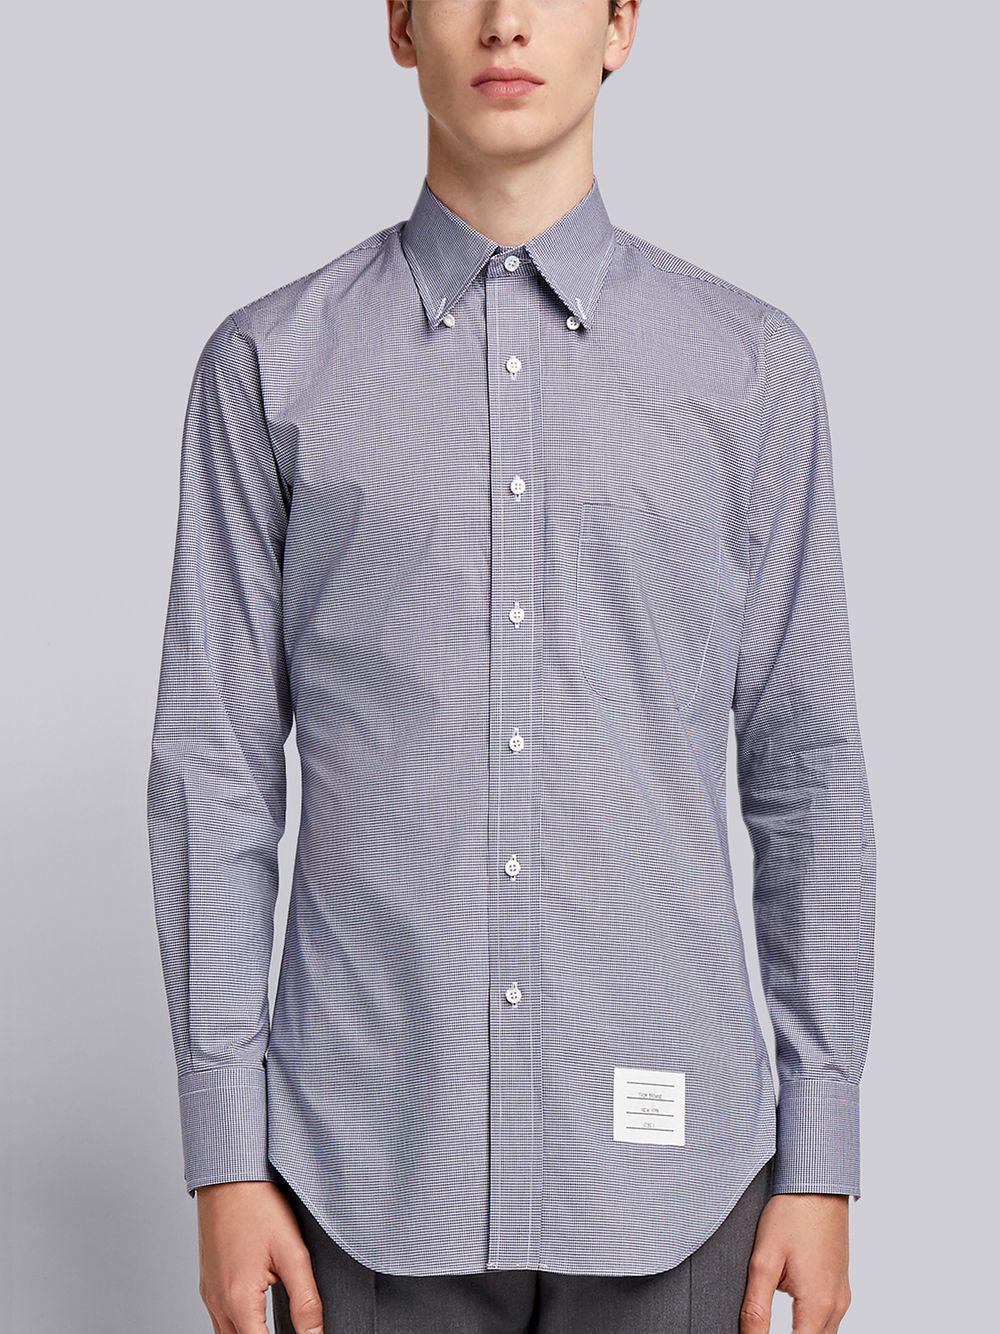 a4898da3283 Thom Browne - Blue Small Gingham Check Poplin Shirt for Men - Lyst. View  fullscreen